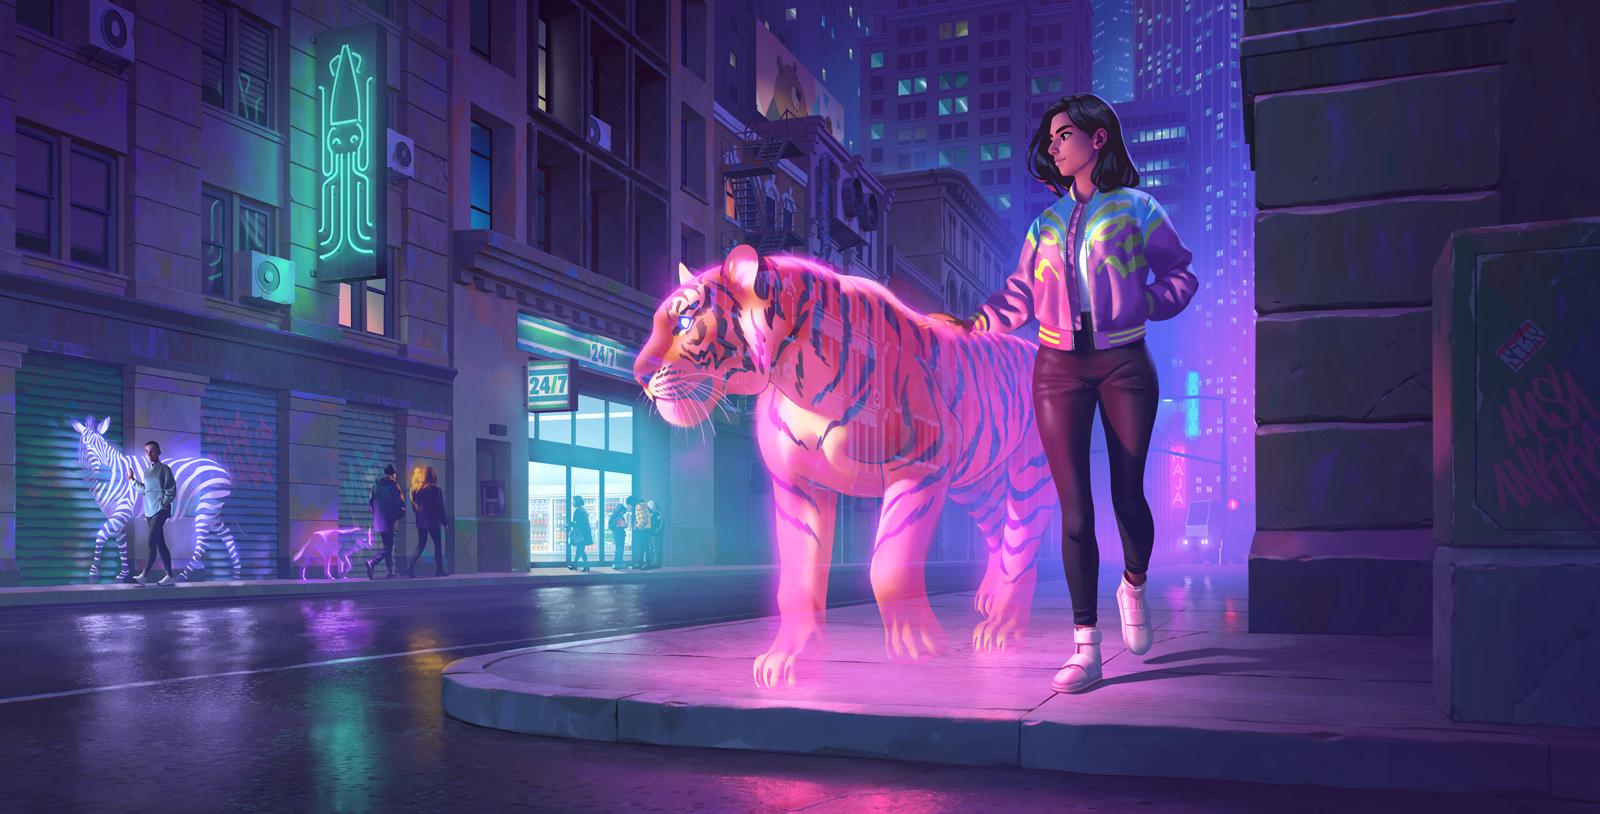 Фото Девушка с тигром, а парень с зеброй идут по улице города, by Ture Ekroos